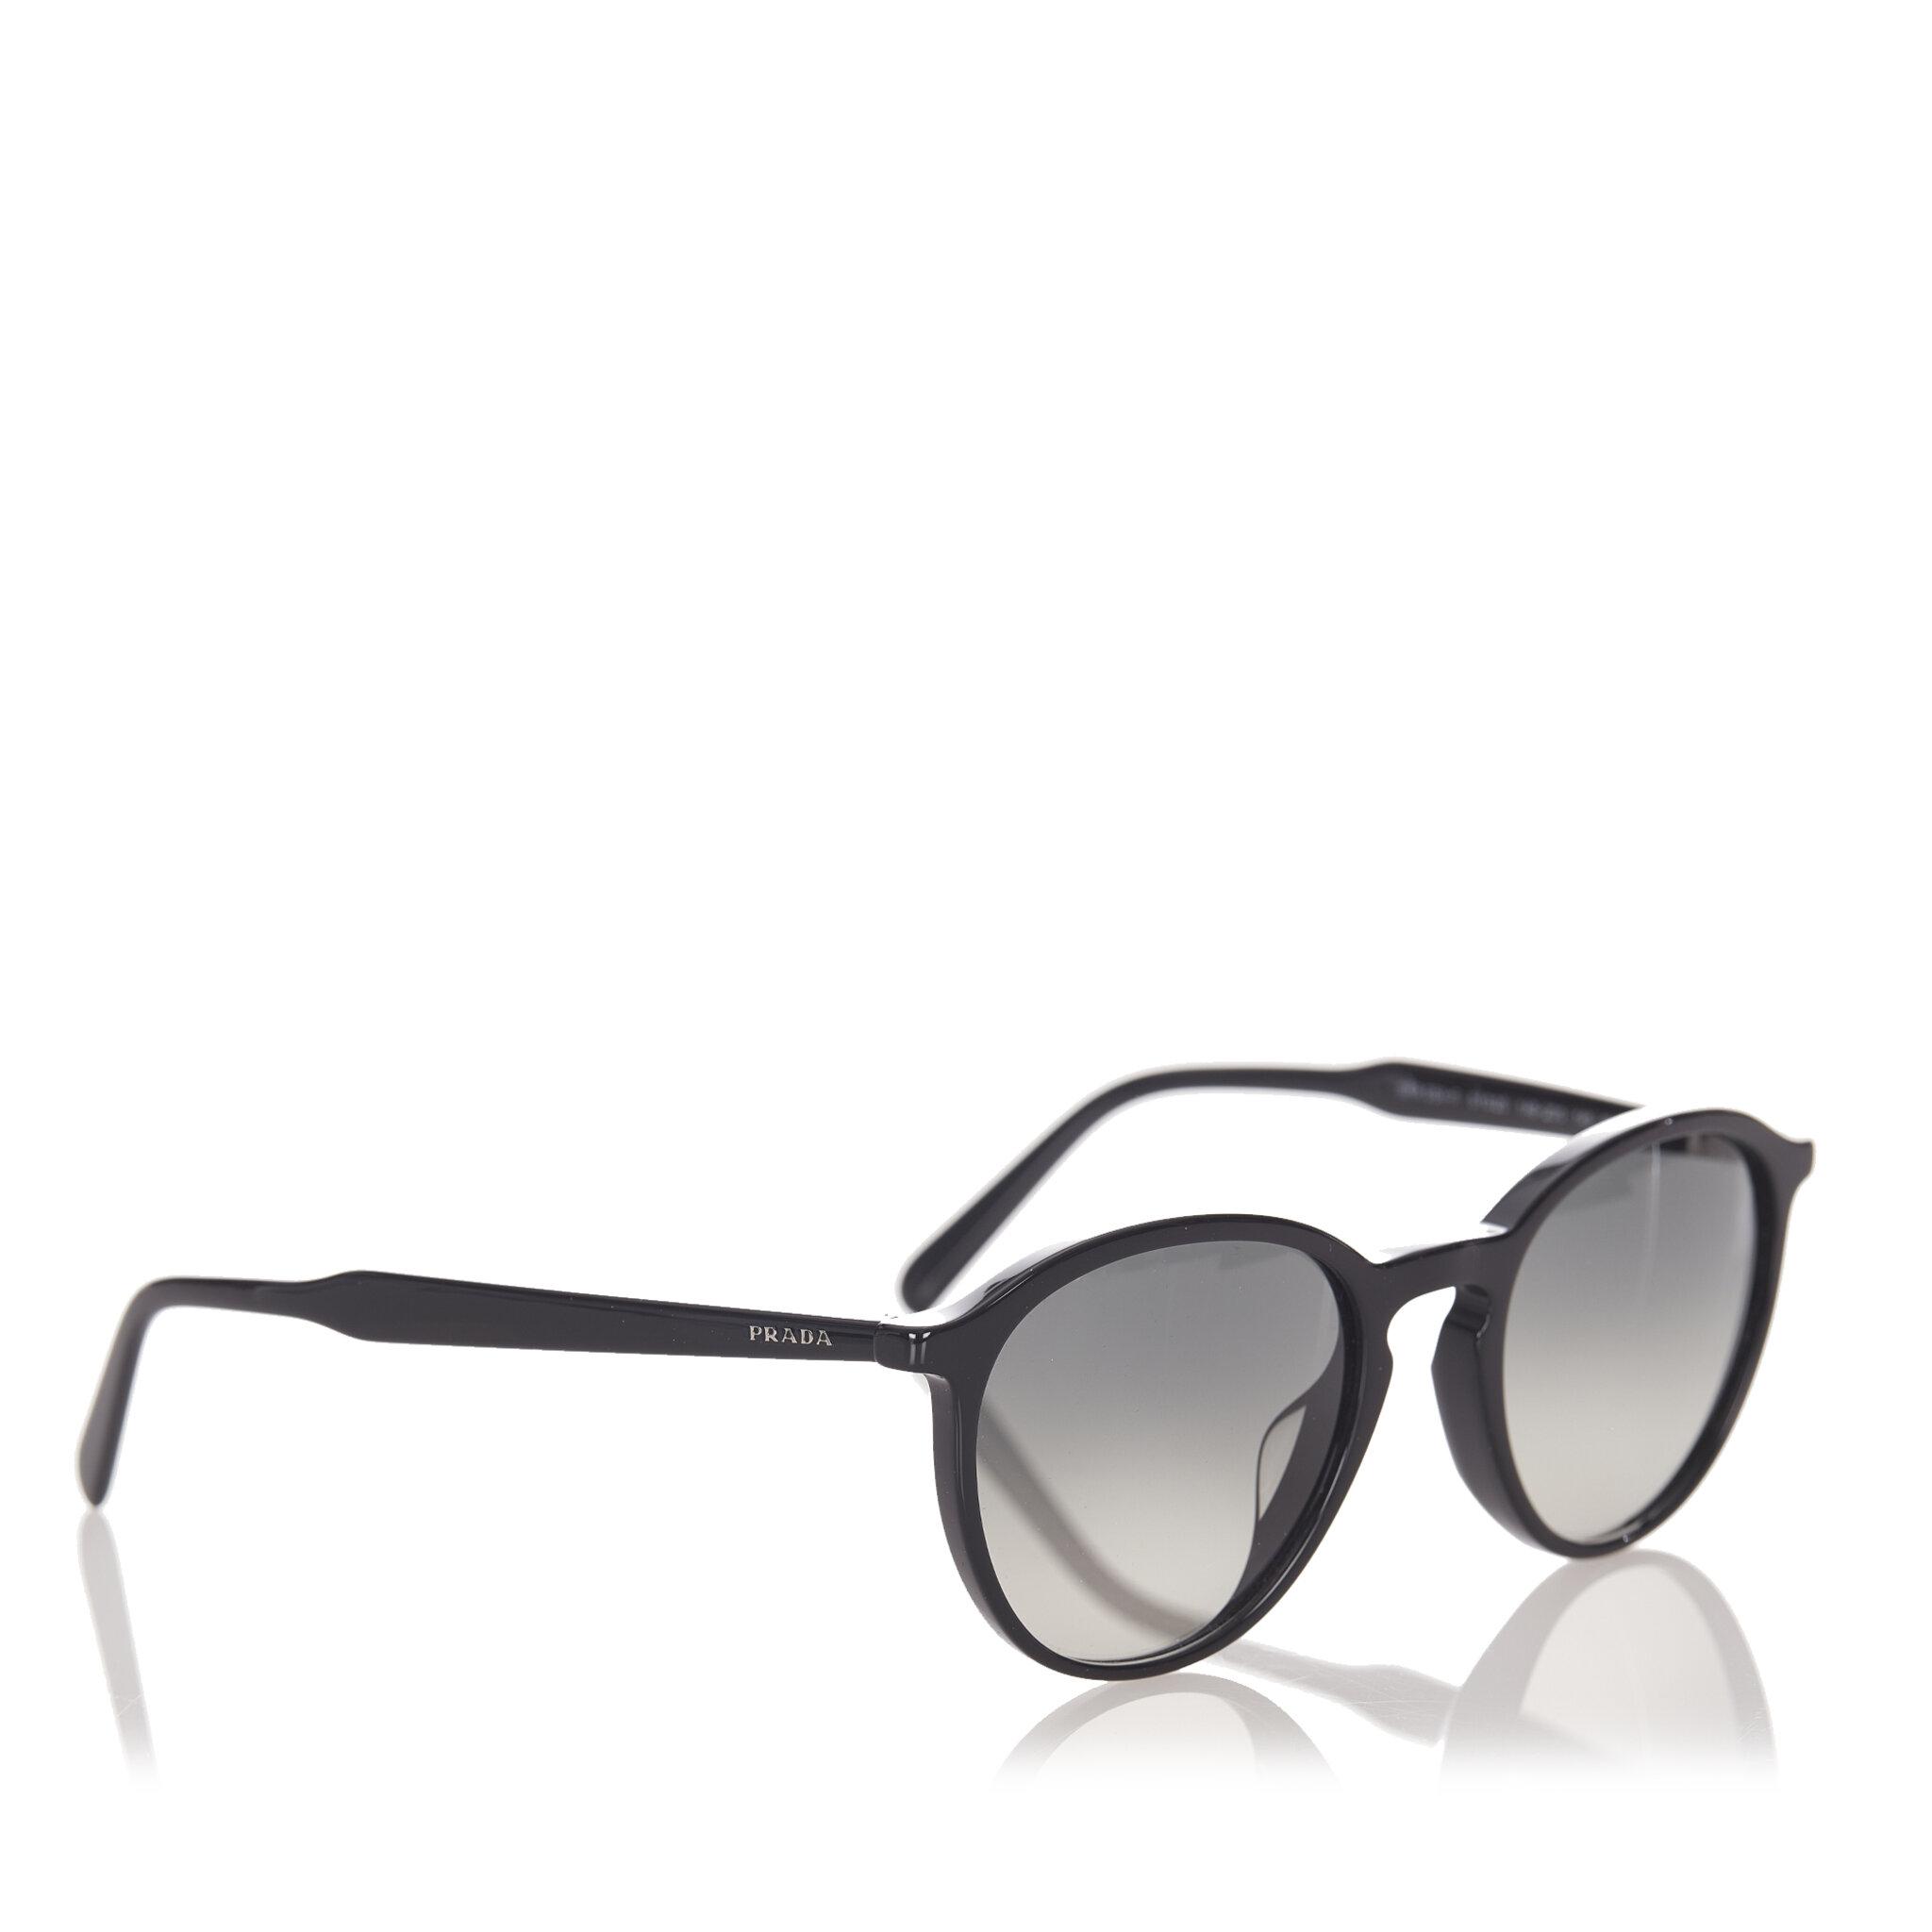 Prada Round Tinted Sunglasses, ONESIZE